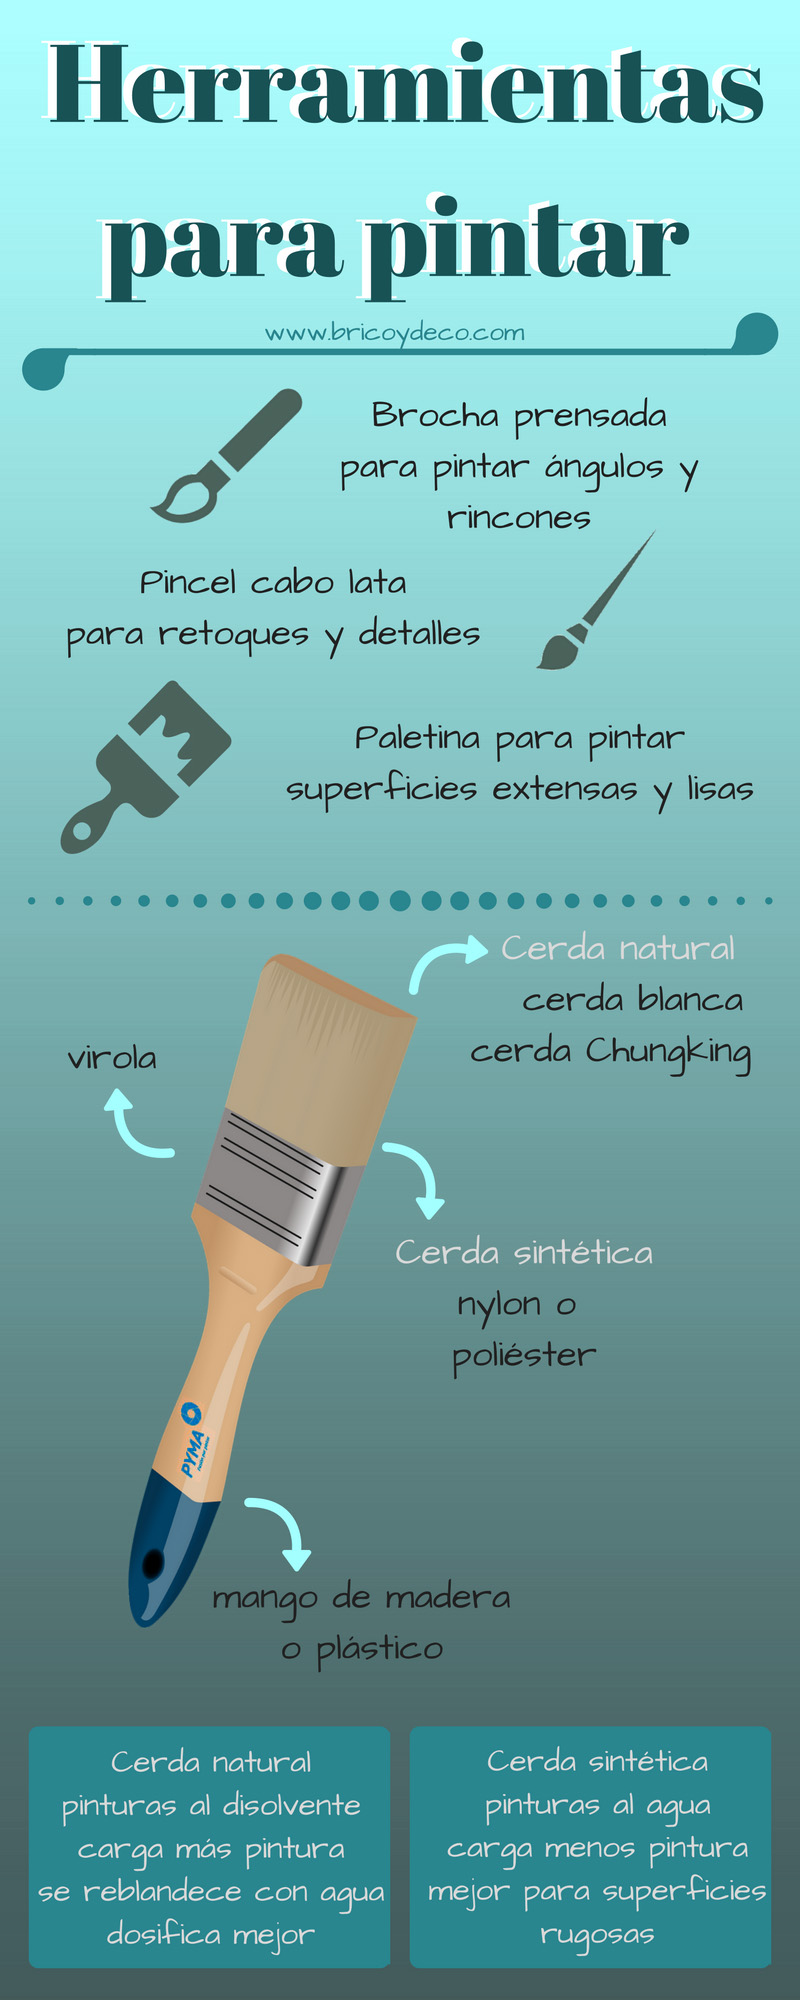 infografía: herramientas para pintar